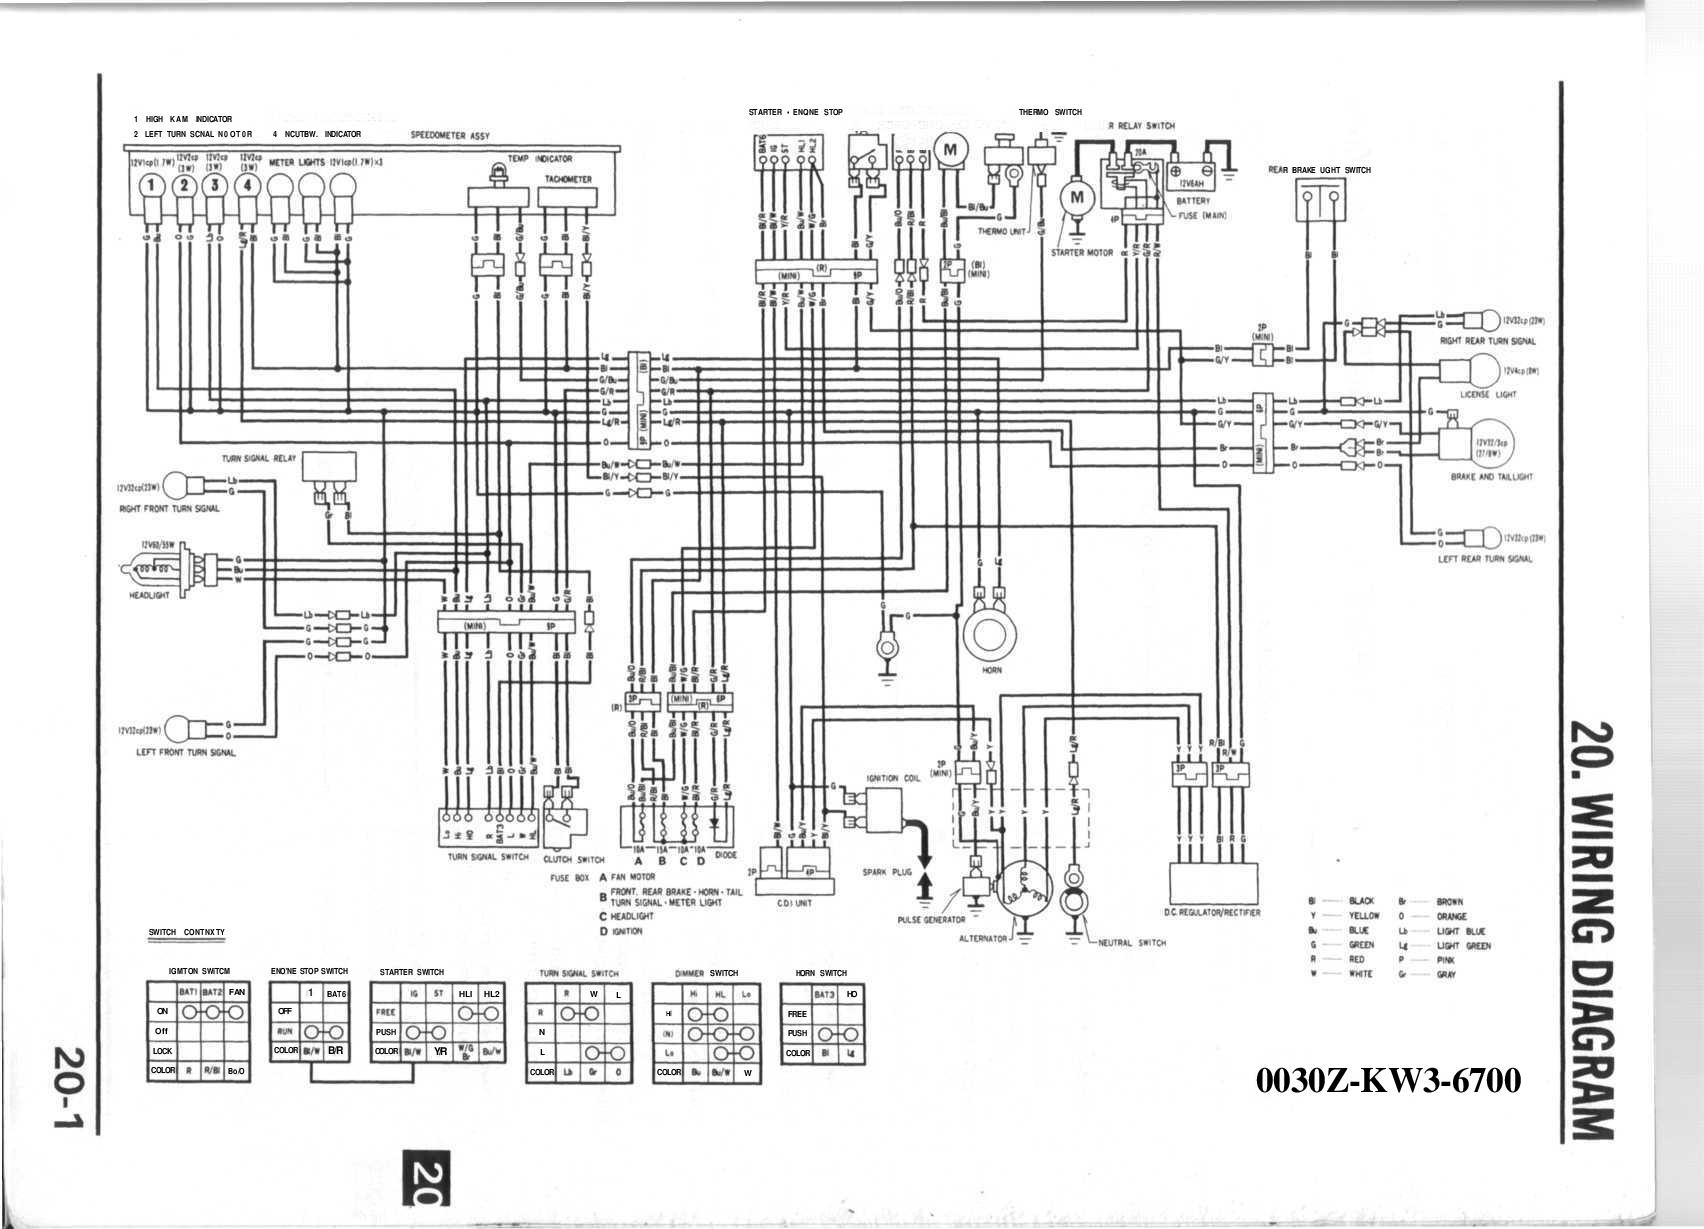 honda gx670 wiring diagram honda nx 250 service manual 20  honda nx 250 service manual 20